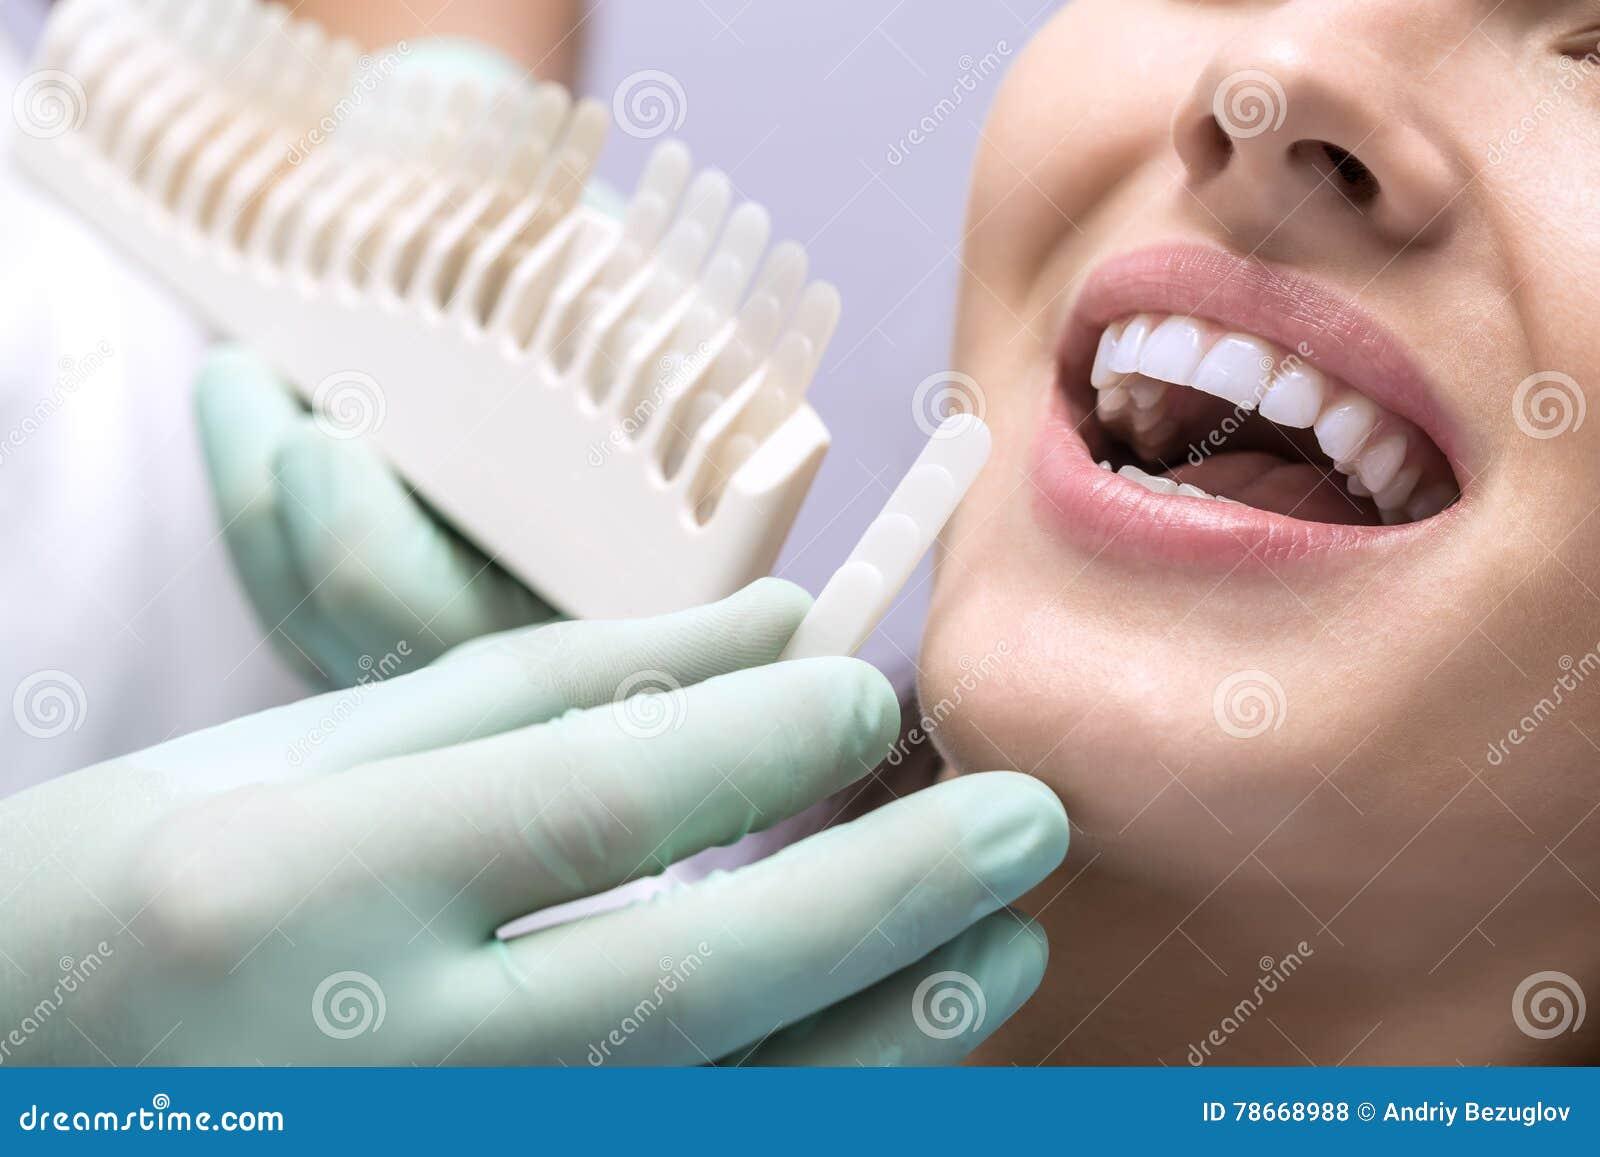 Teeth Color Comparison Stock Photo Image Of Medicine 78668988